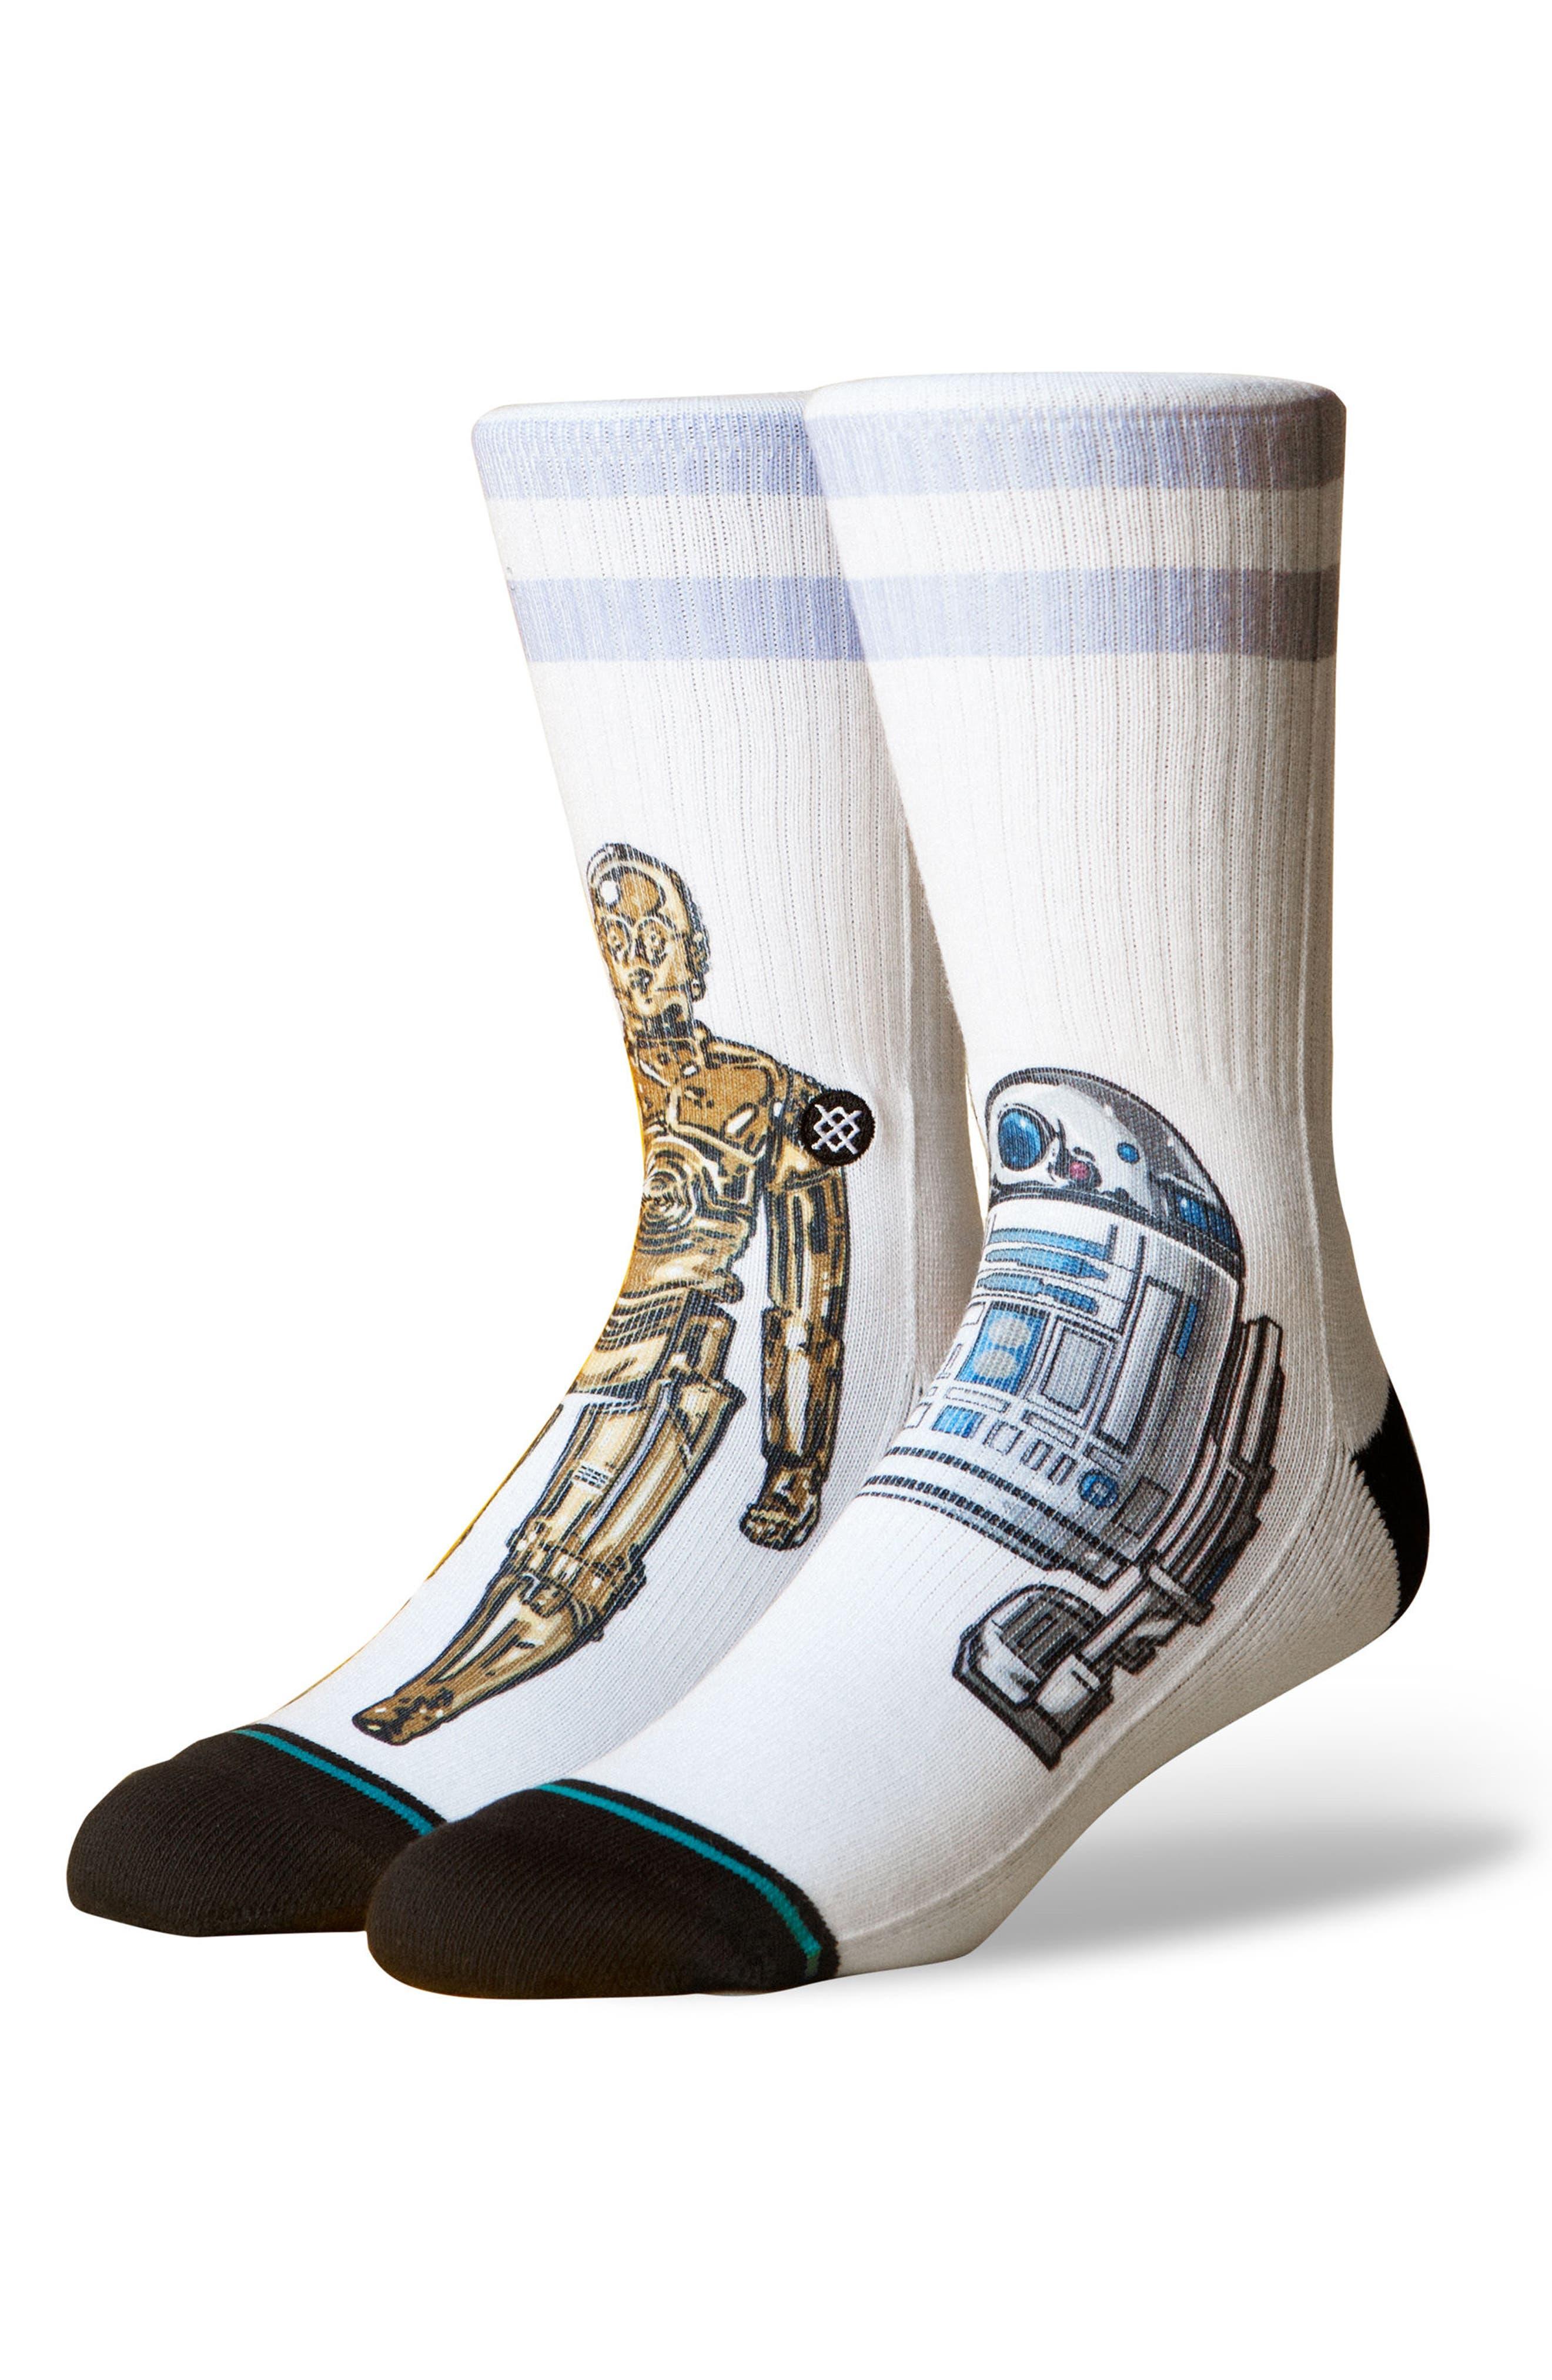 Alternate Image 1 Selected - Stance Star Wars™ Prime Condition Socks